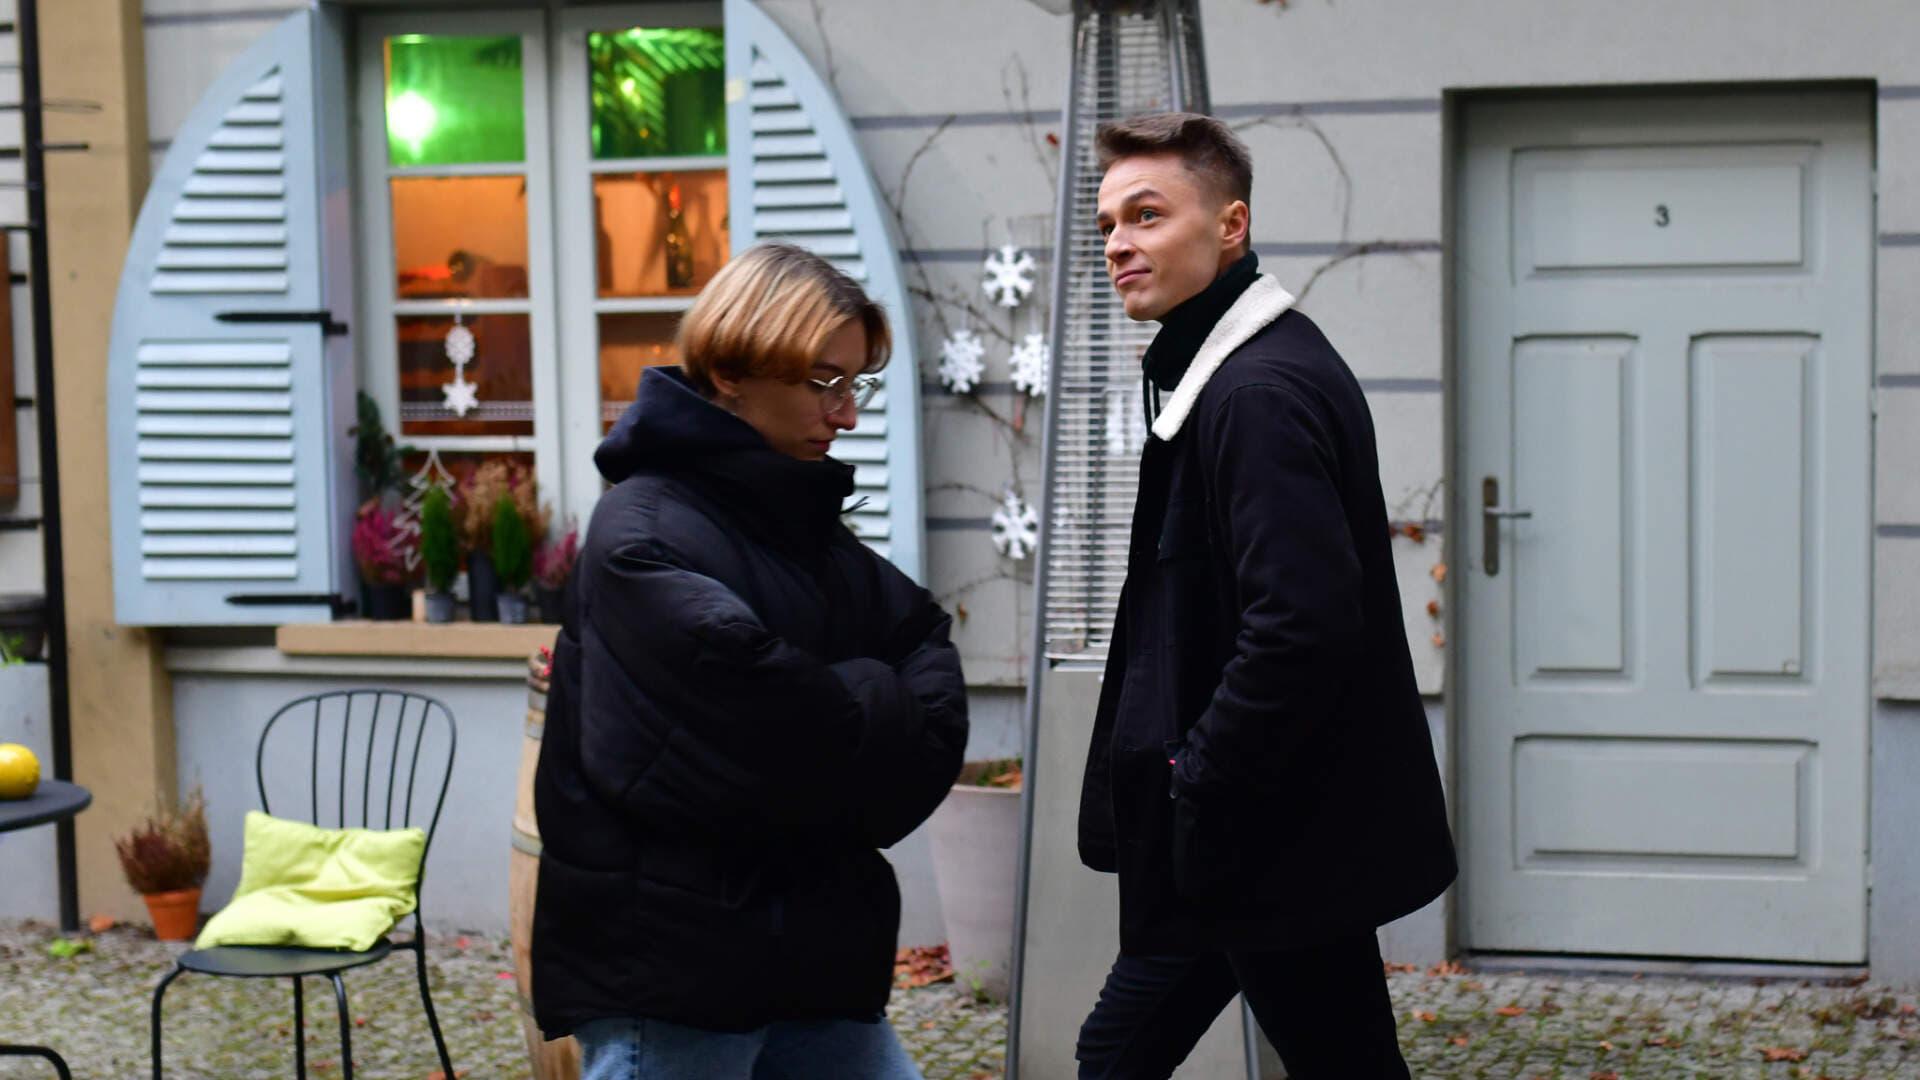 Zakochani po uszy - Season 5 Episode 39 : Episode 39